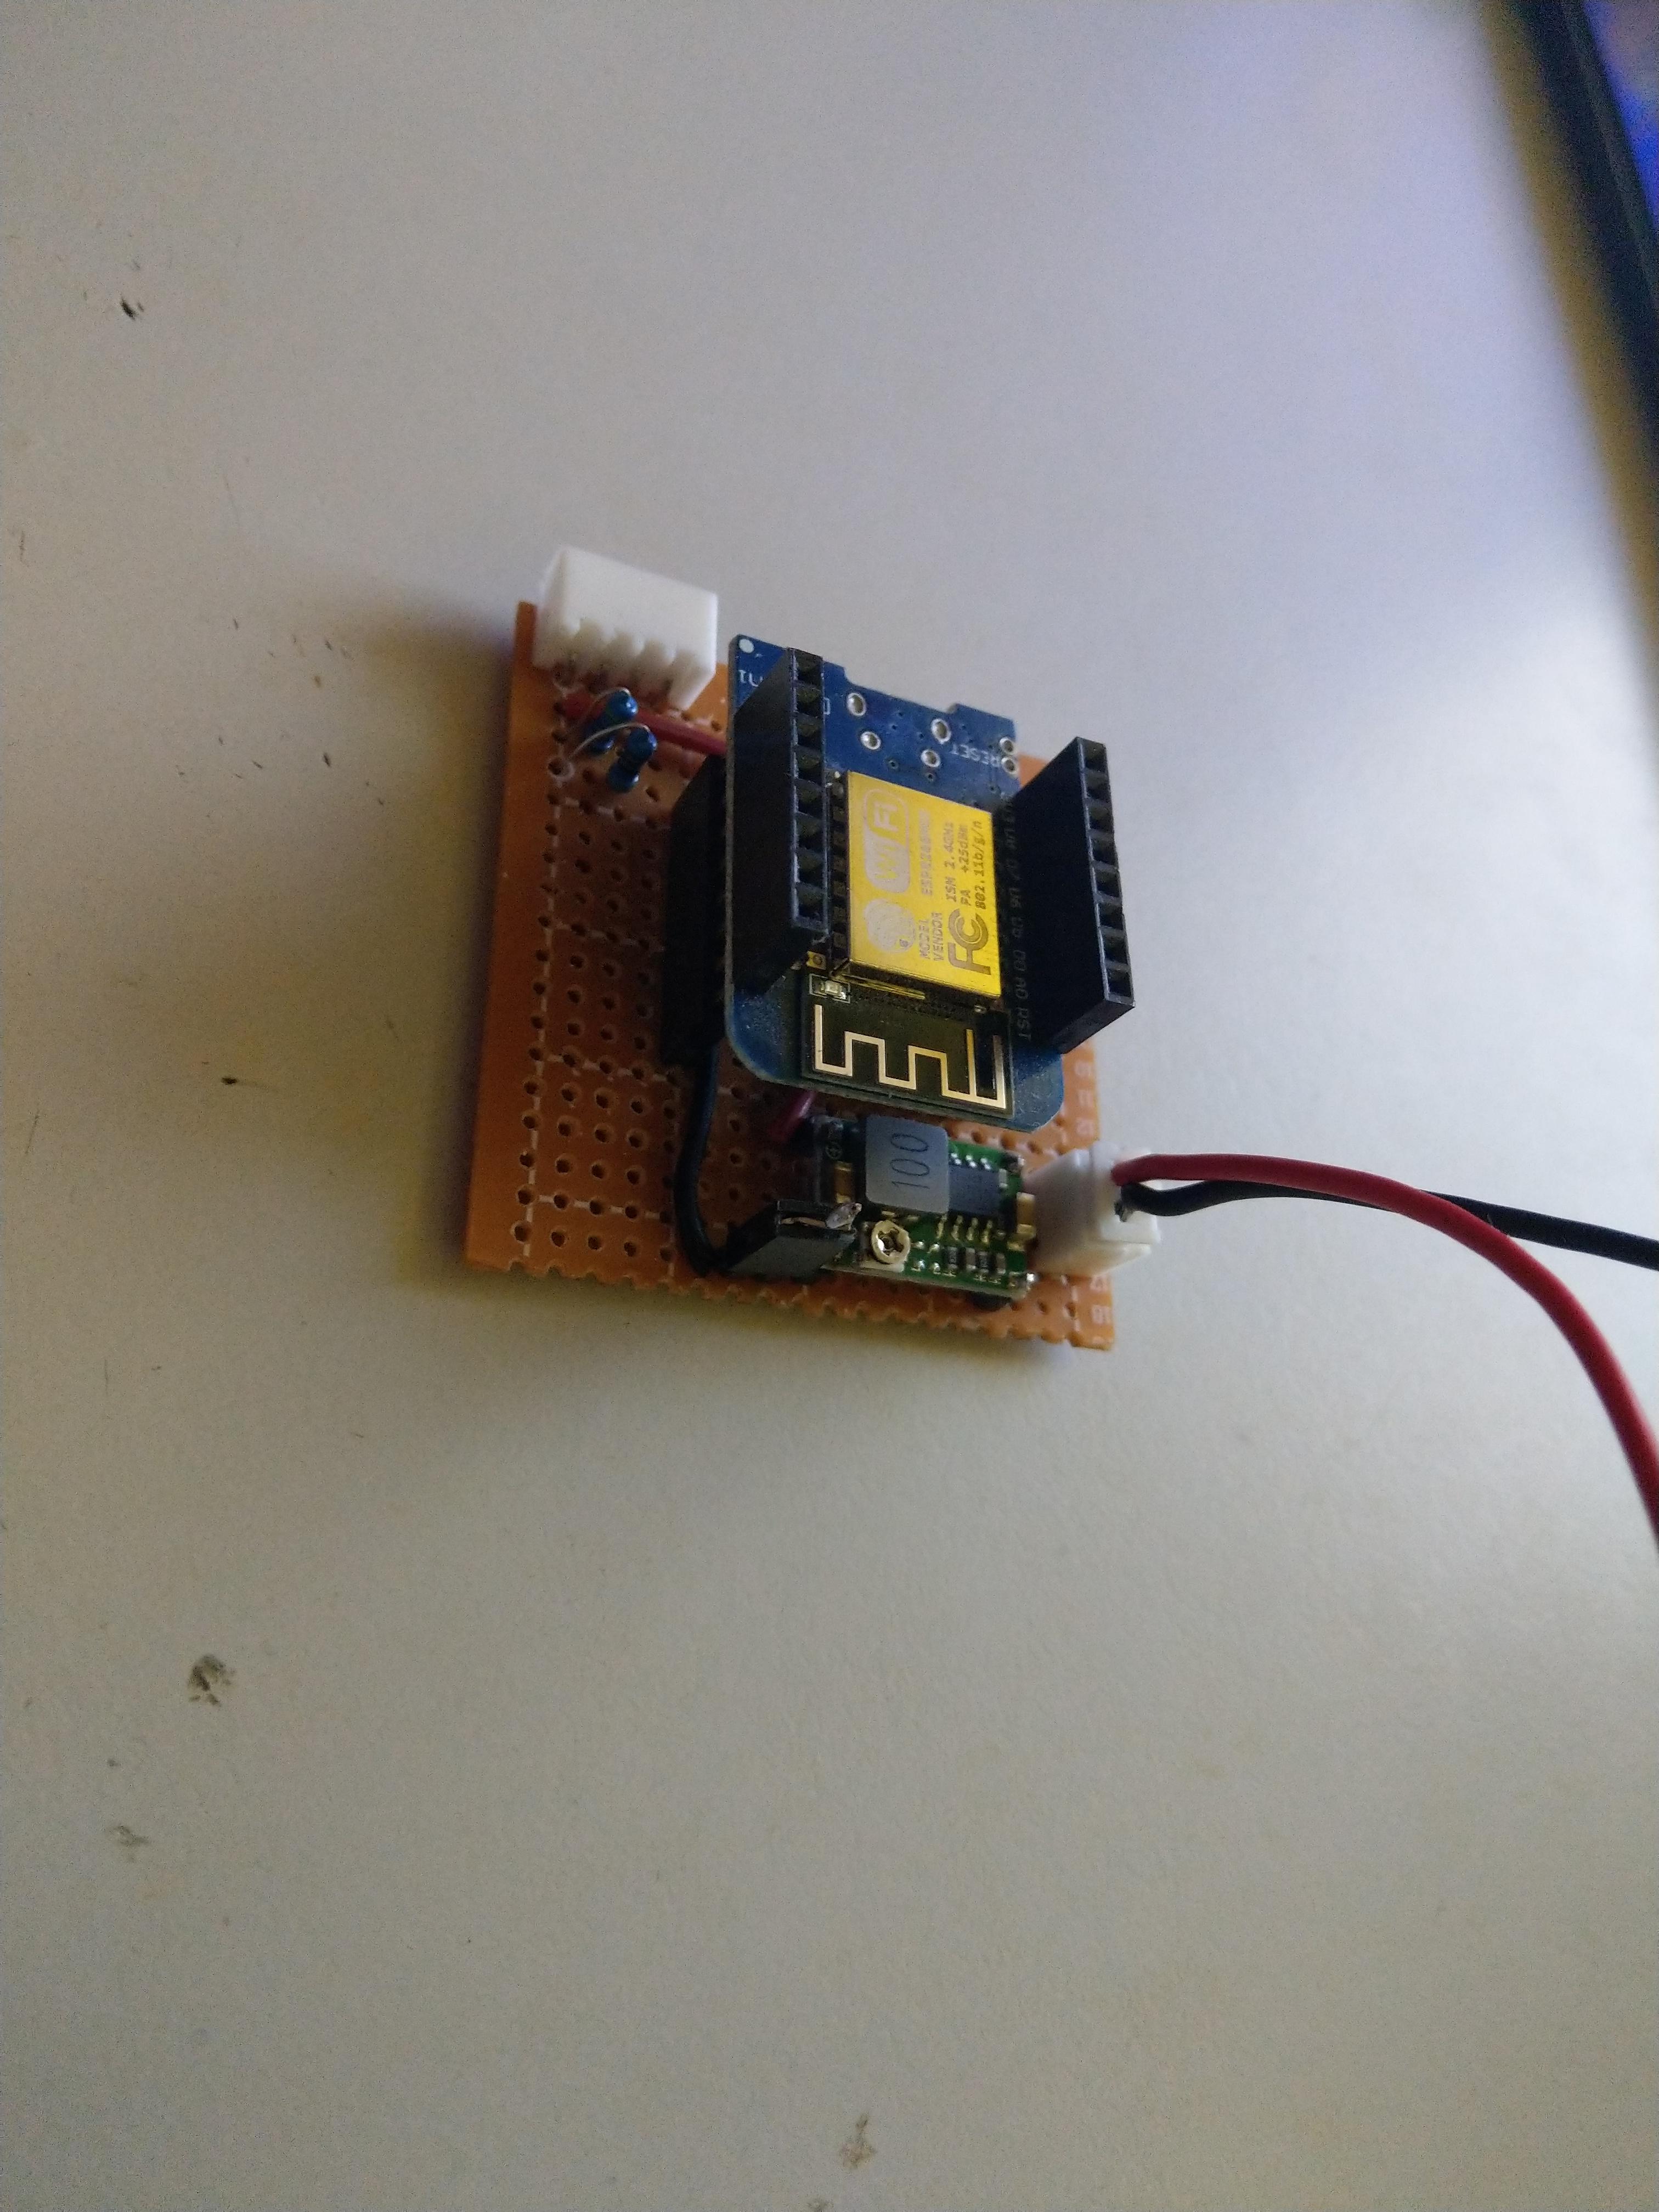 DIY Lithium Battery Balancer and monitoring (BMS) - Hardware - Community